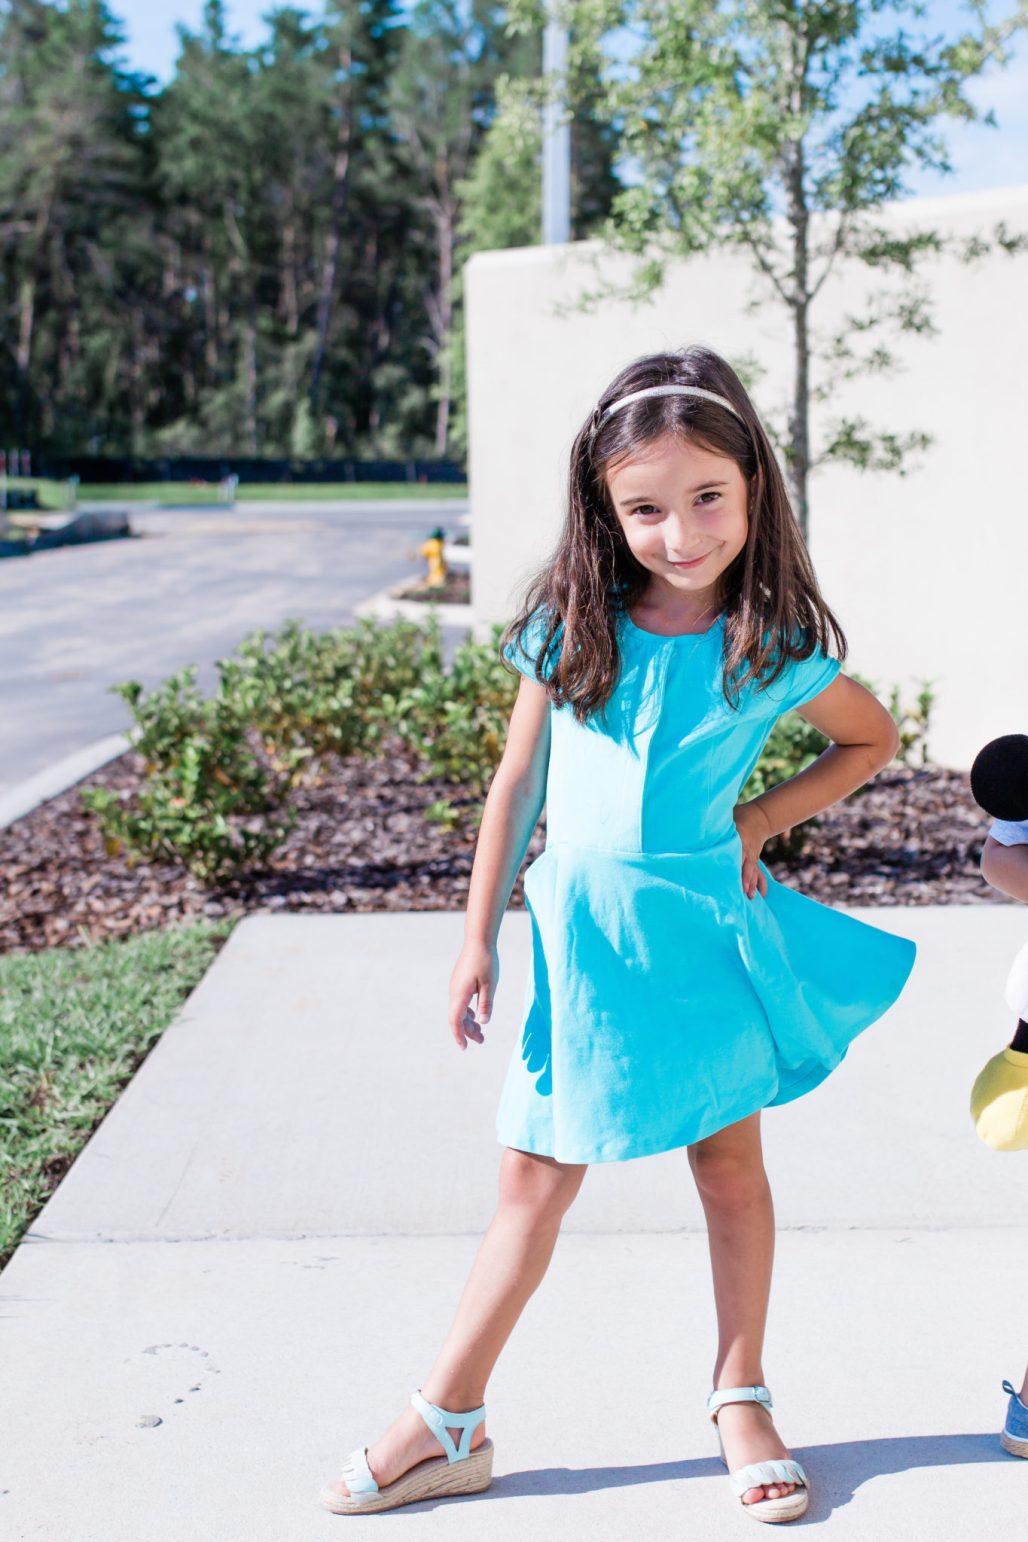 Art & Eden, fashion for boys and girls, organic clothing, summer fashion for kids, Tampa parenting blog mothers blog motherhood blog Florida travel blogger travel influencer healthy mom blogger spring hill florida lifestyle parenting blog best mom blog 2018